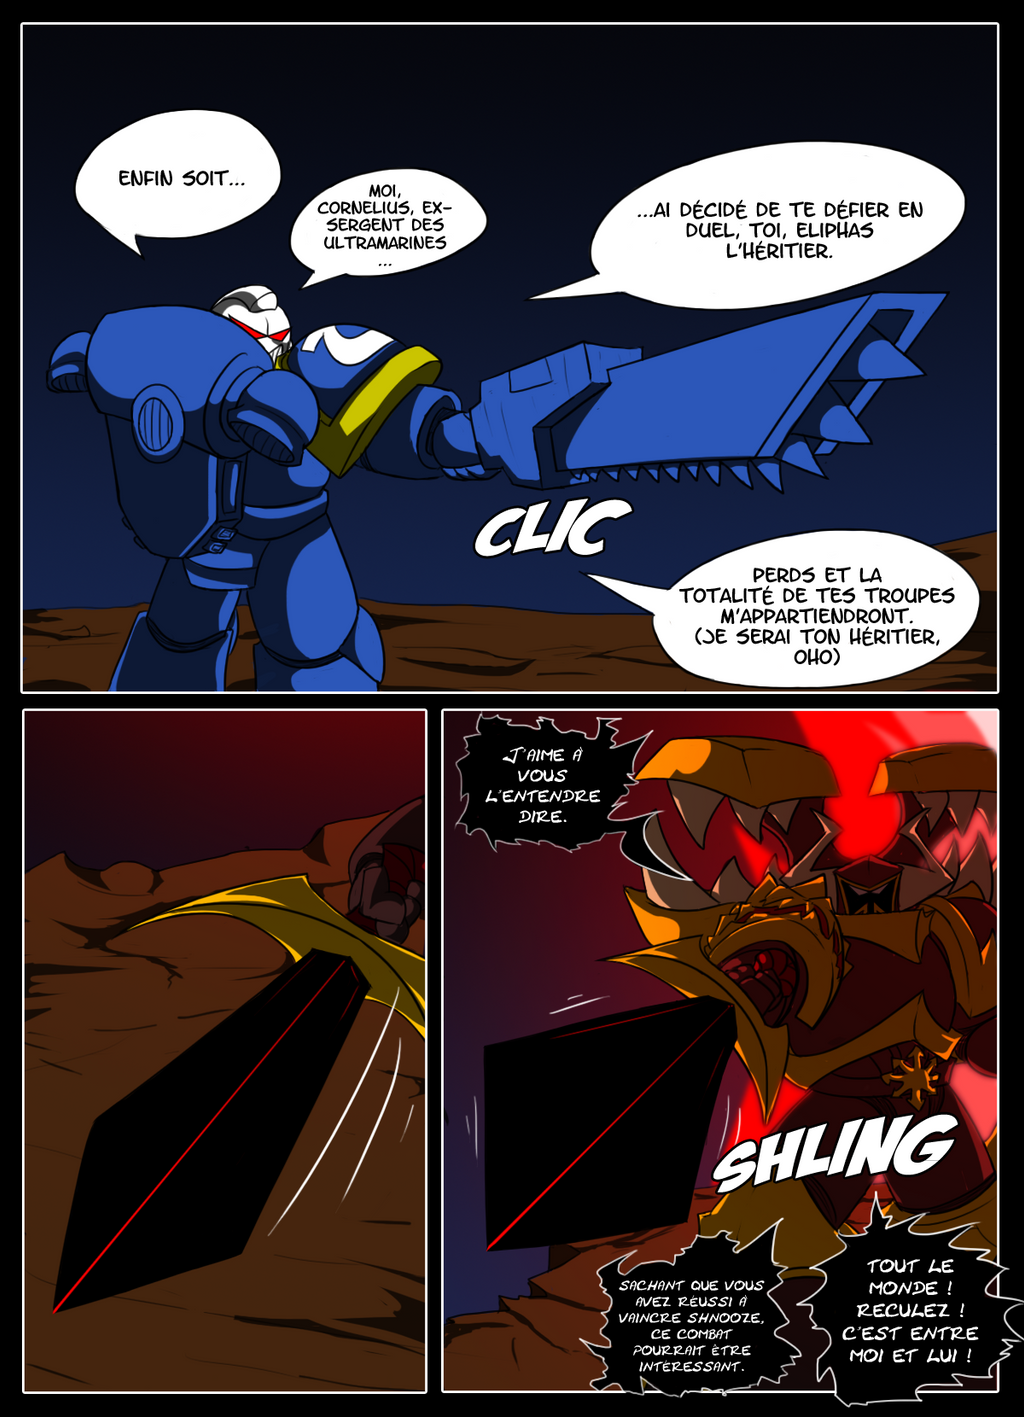 Bandes Dessinées de Warhammer 40,000 - Page 2 P39__color_by_littlecutter-d5ryyd7